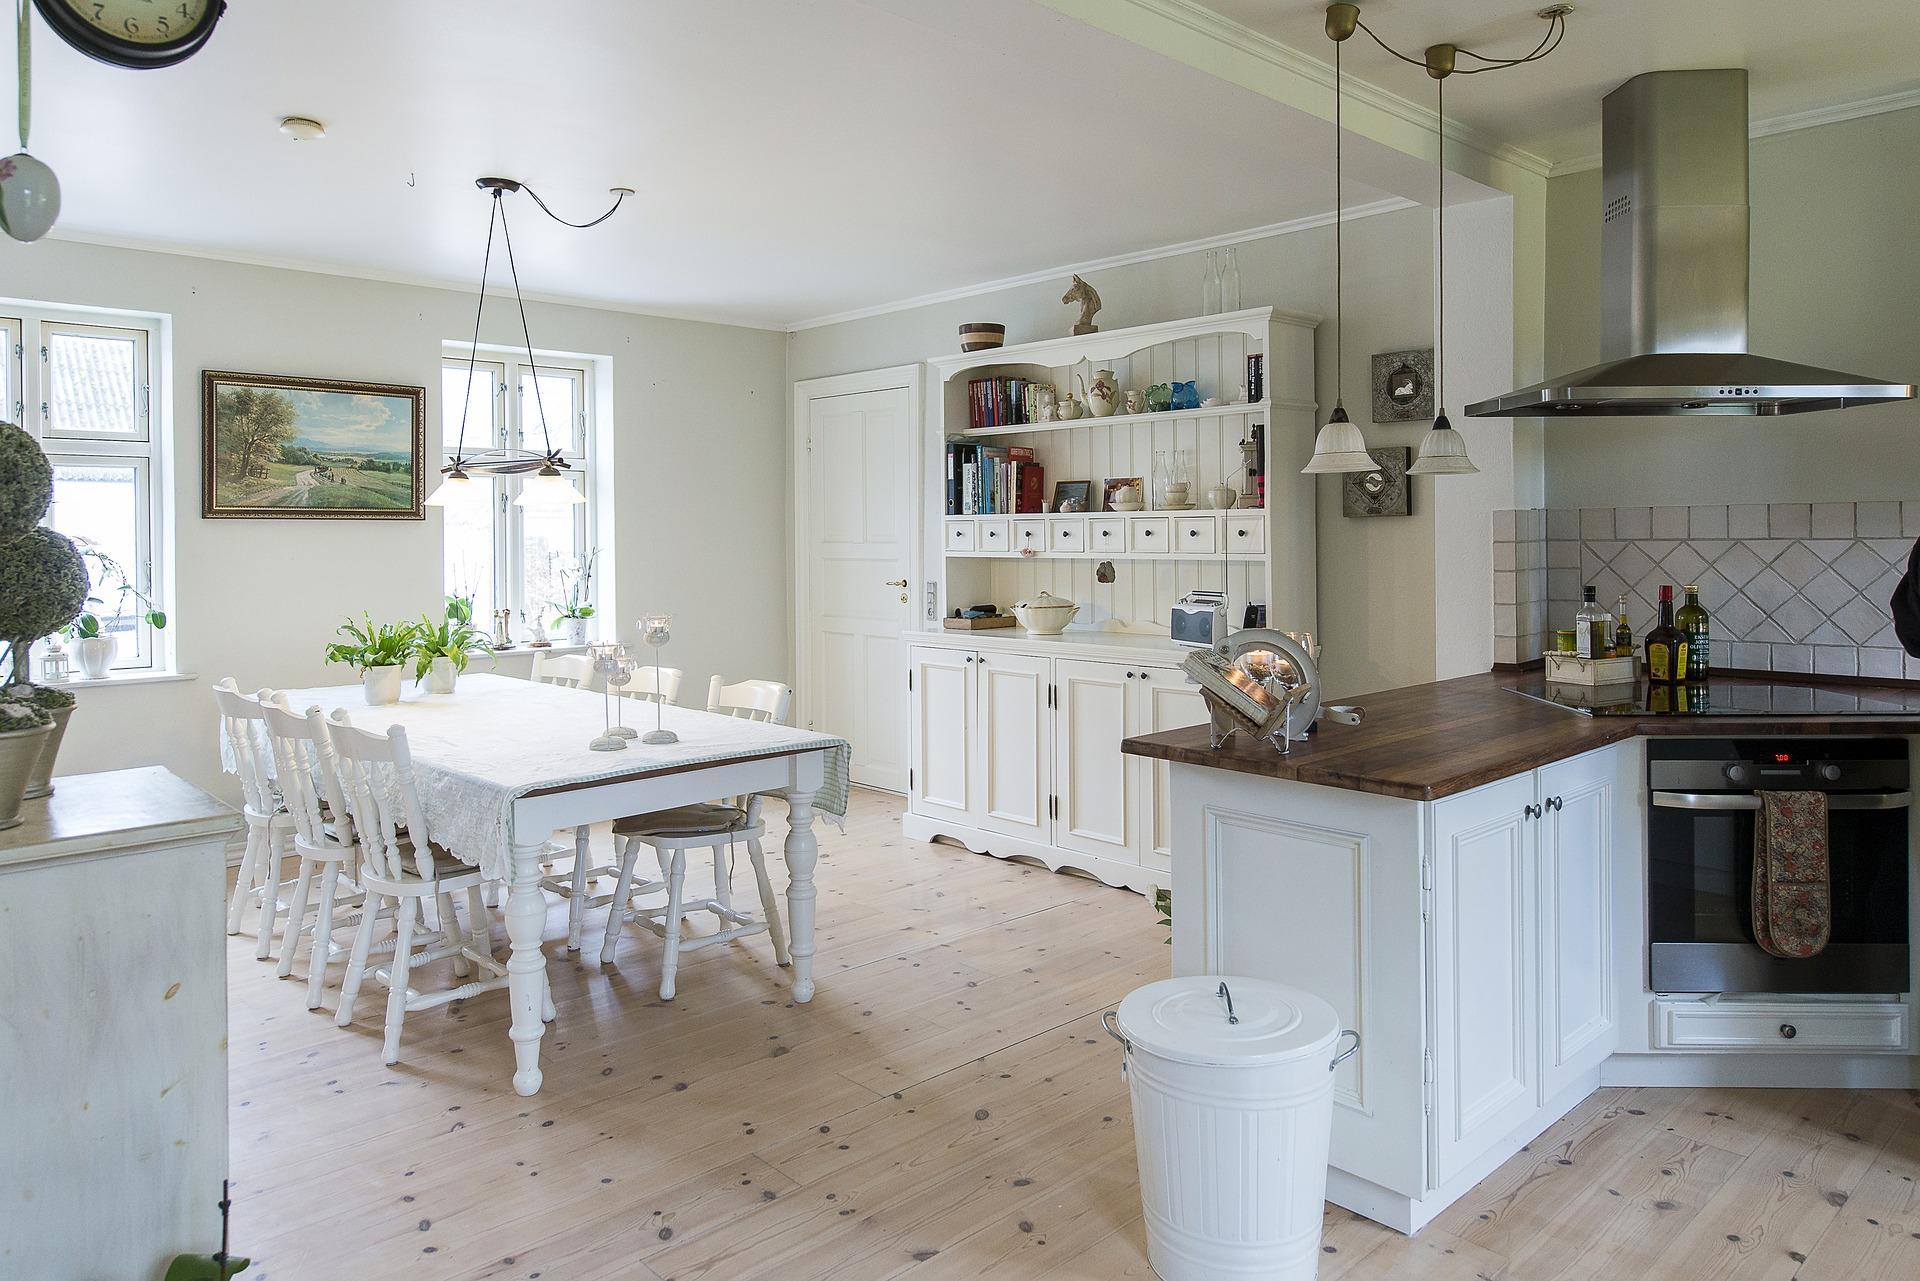 Illuminazione country chic per una cucina di stile